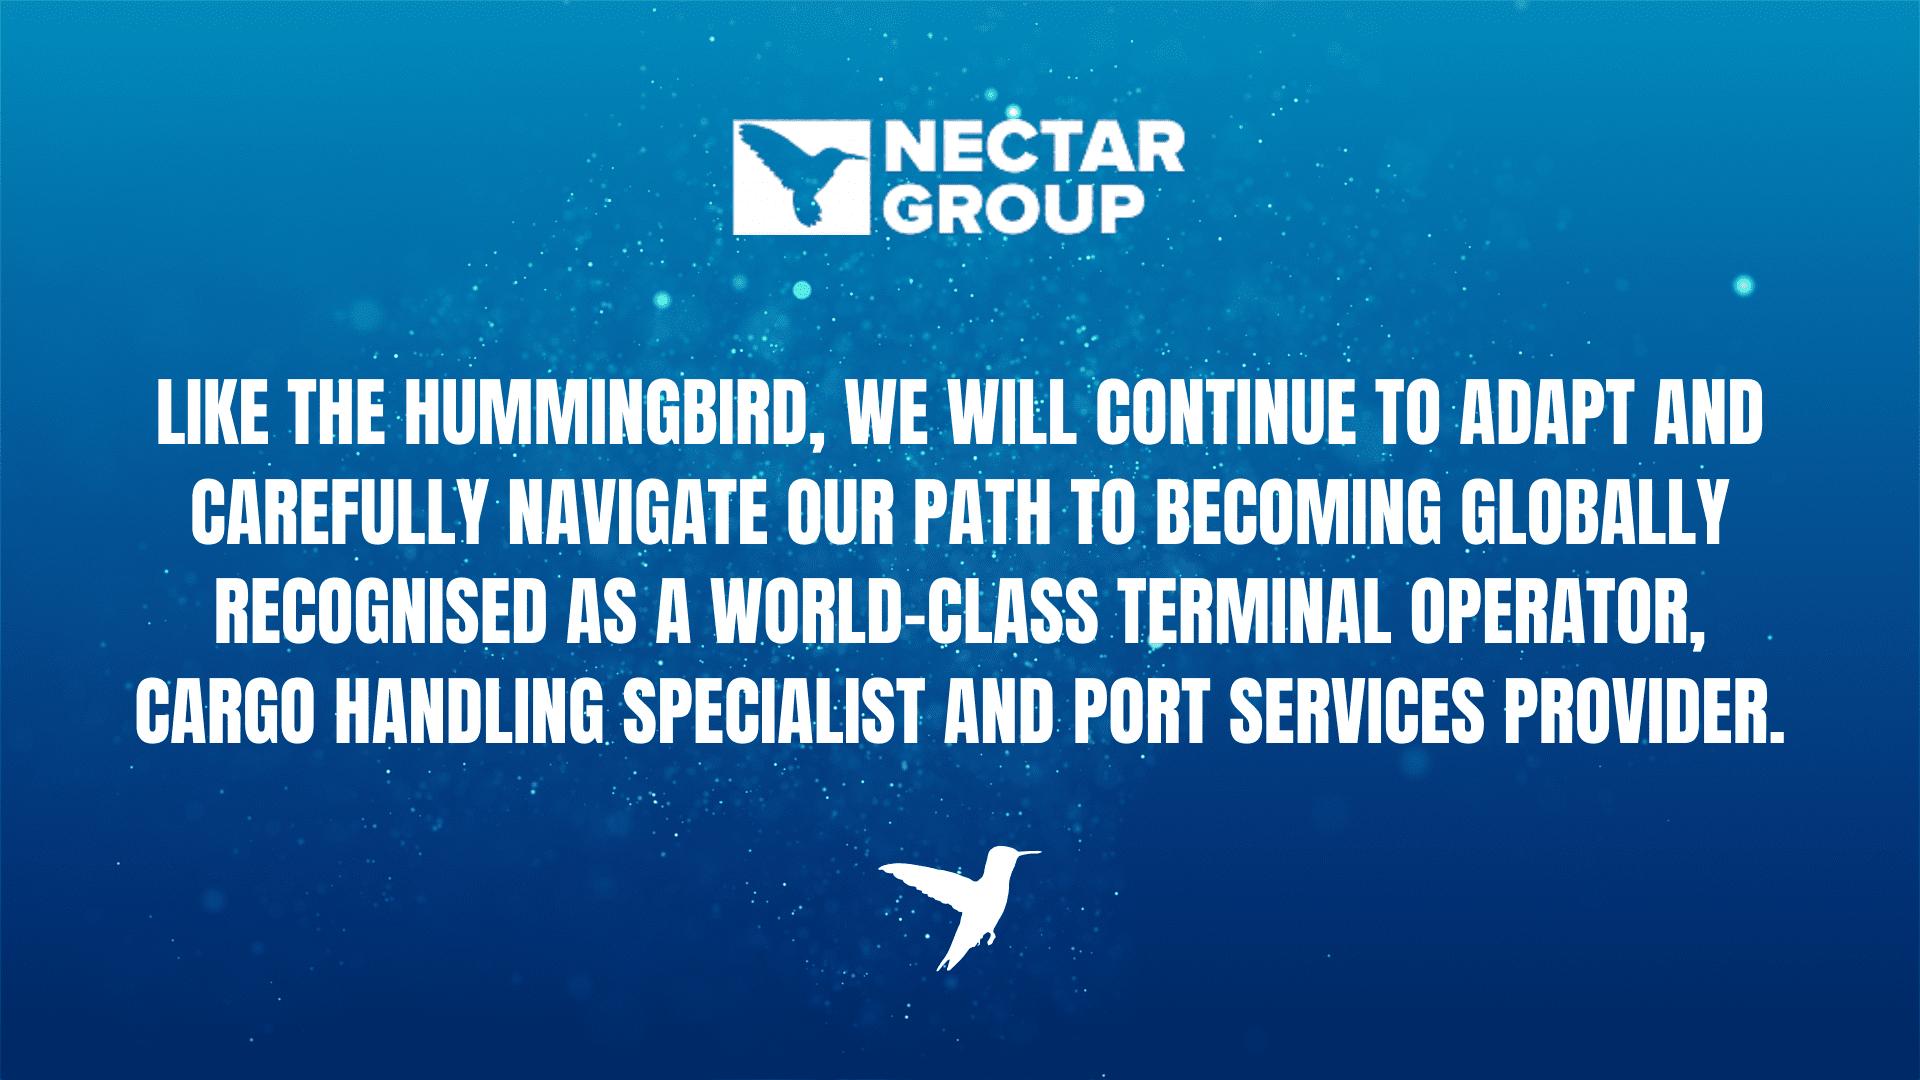 Nectar Post Proposal Hummingbird Website